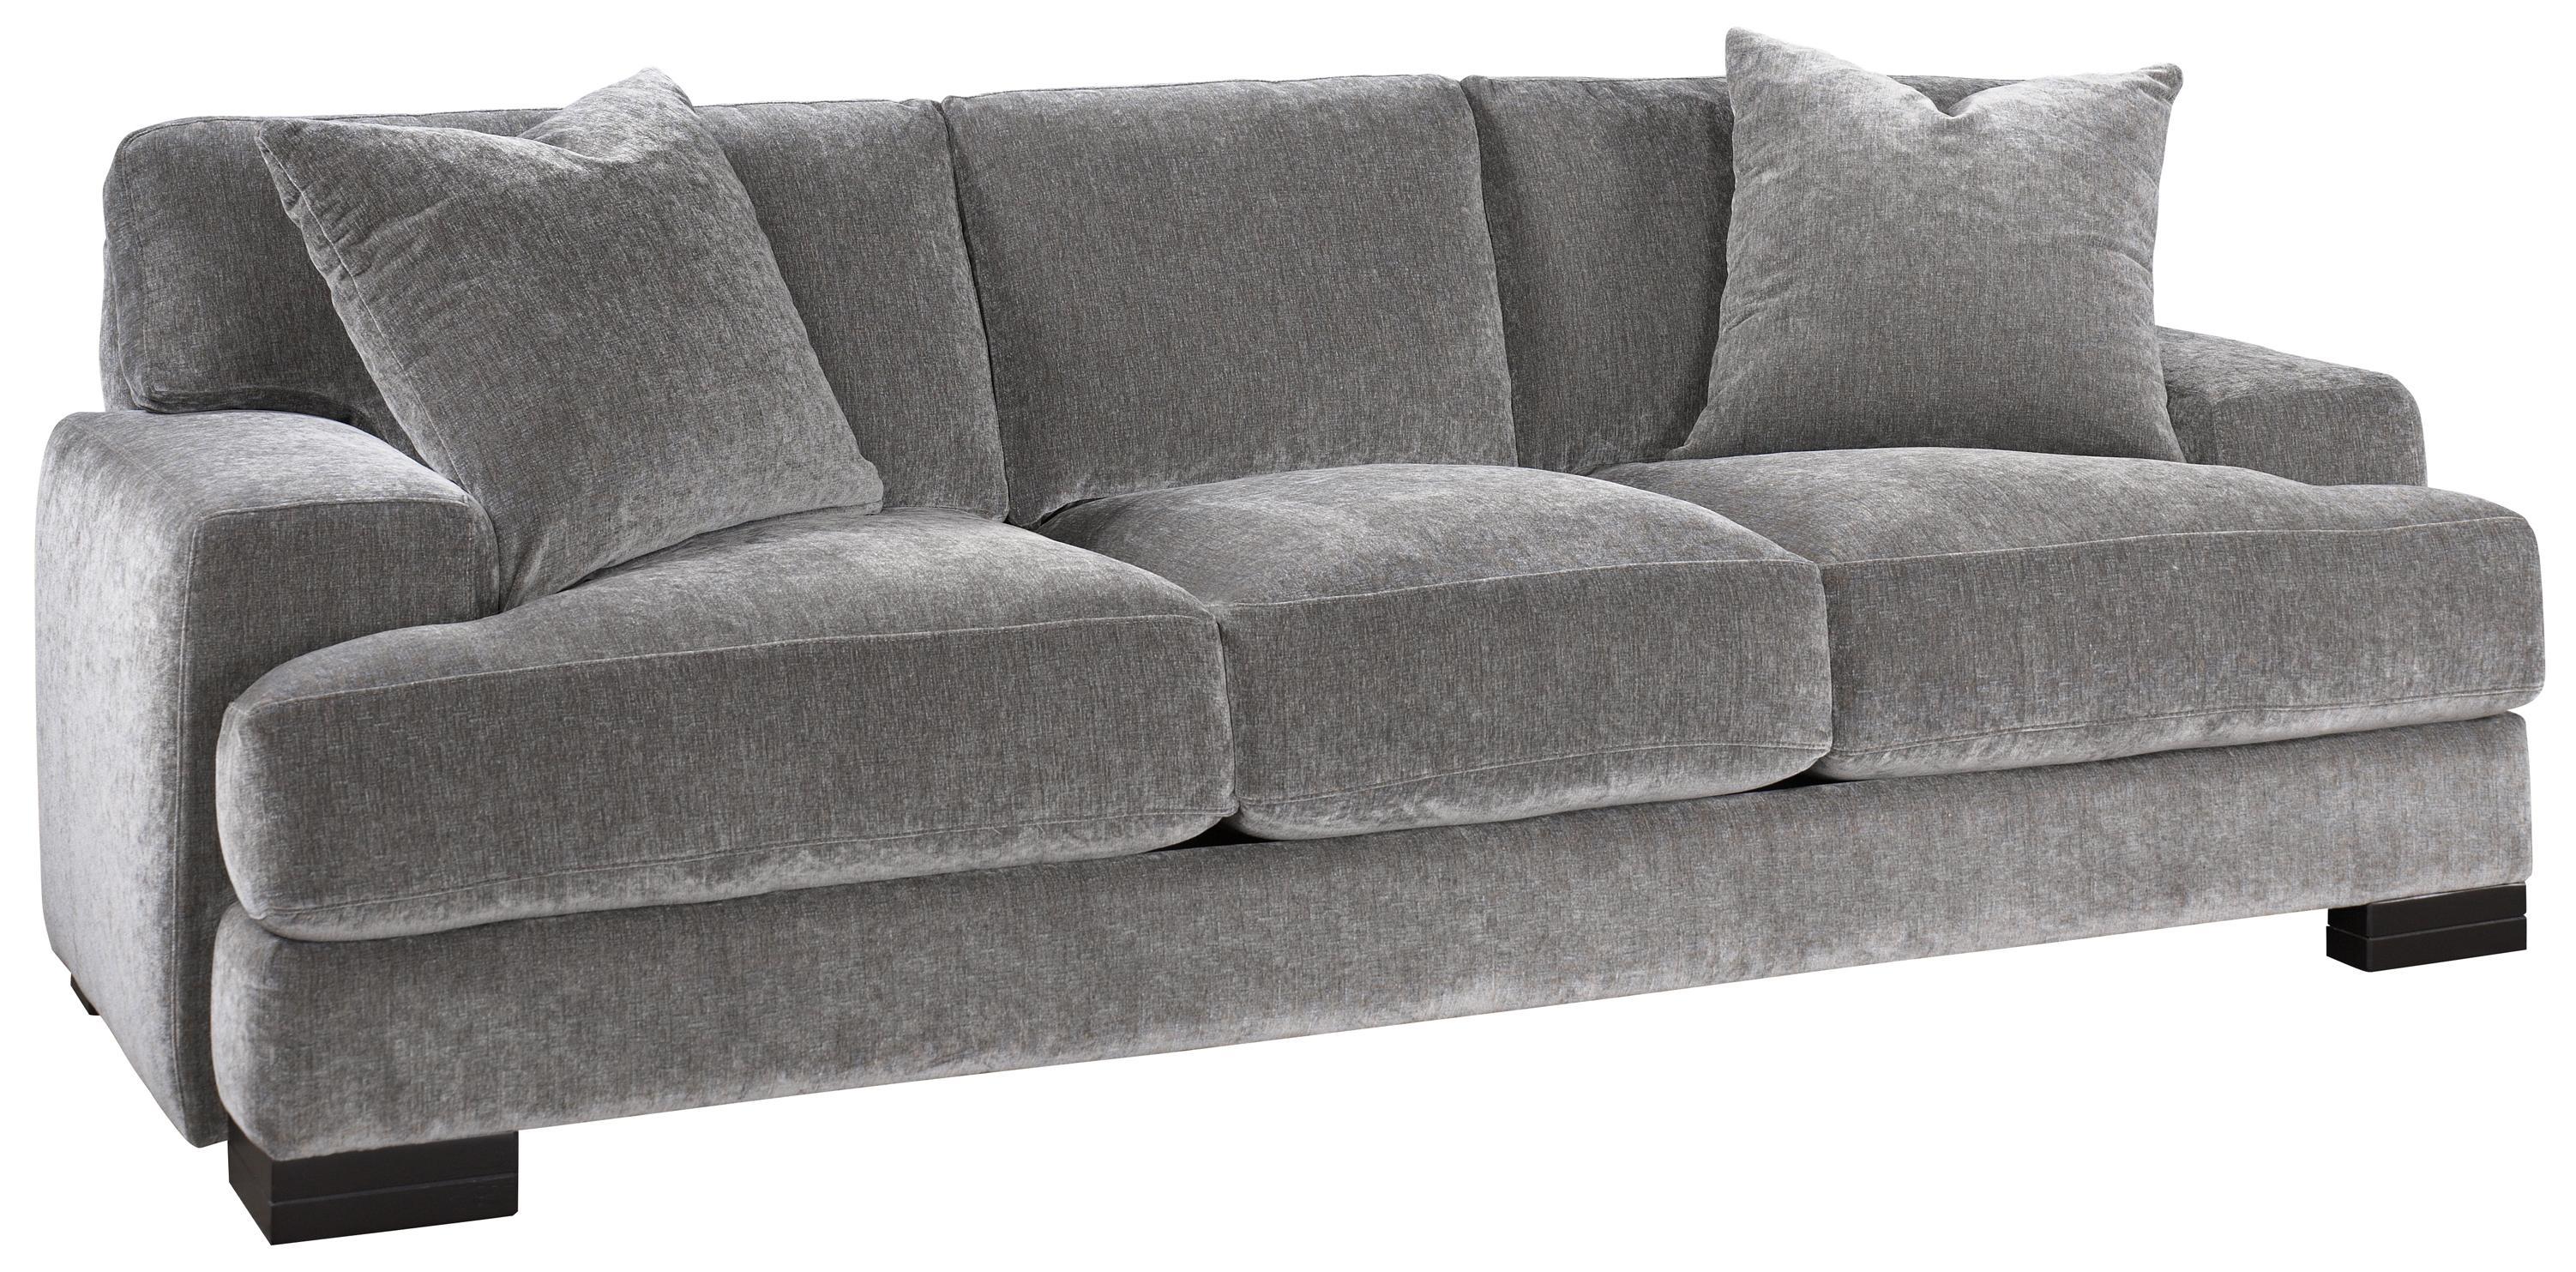 jonathan louis sofas hand woven havana 4 seater sofa set grey burton modern with low track arms and